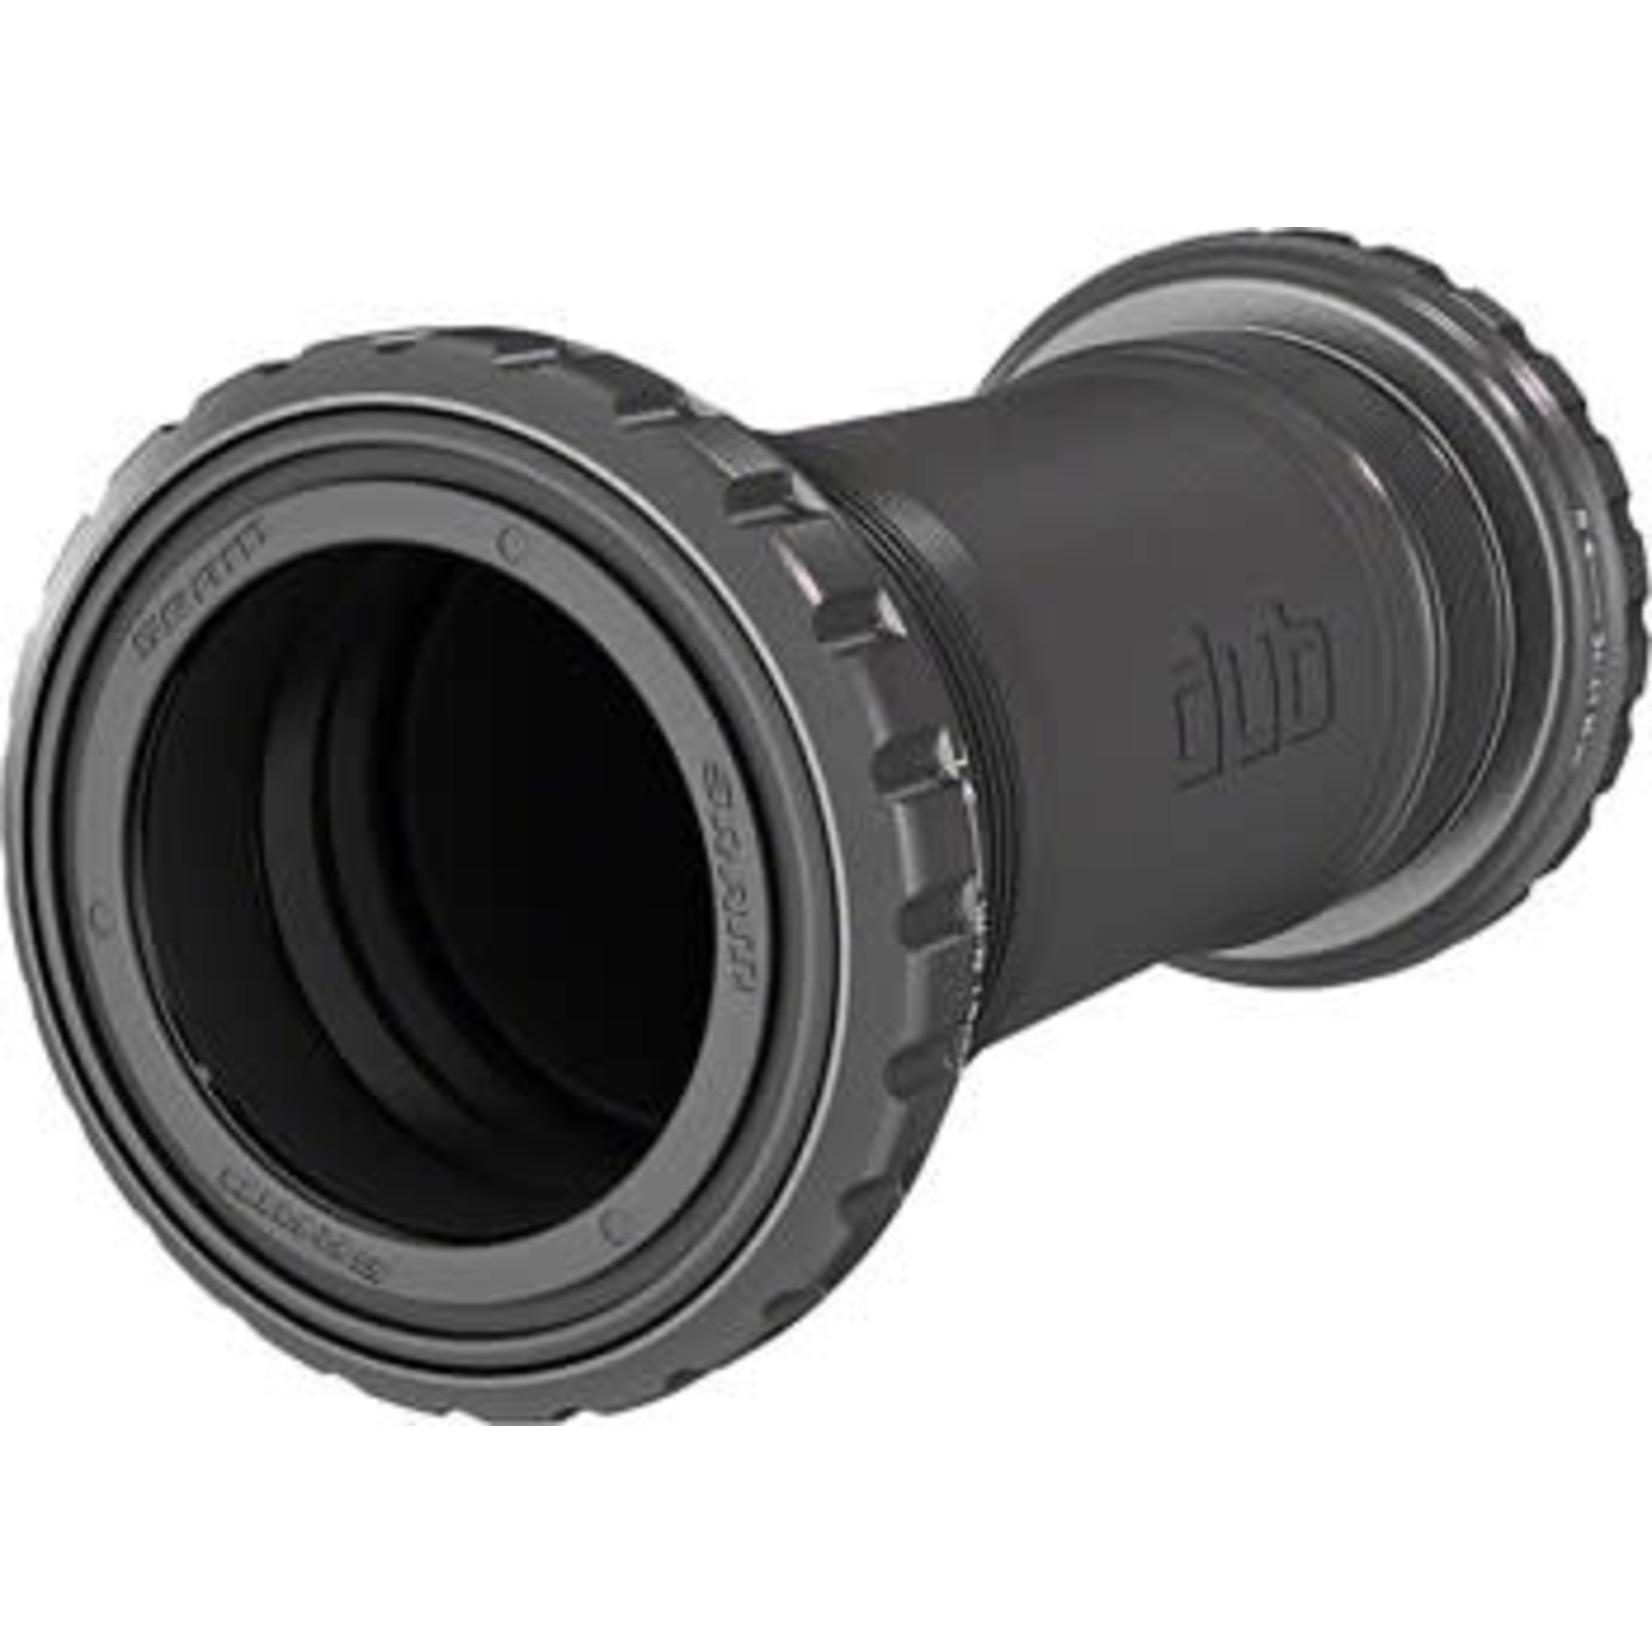 SRAM SRAM DUB Bottom Bracket PressFit (MTB) 89/92mm